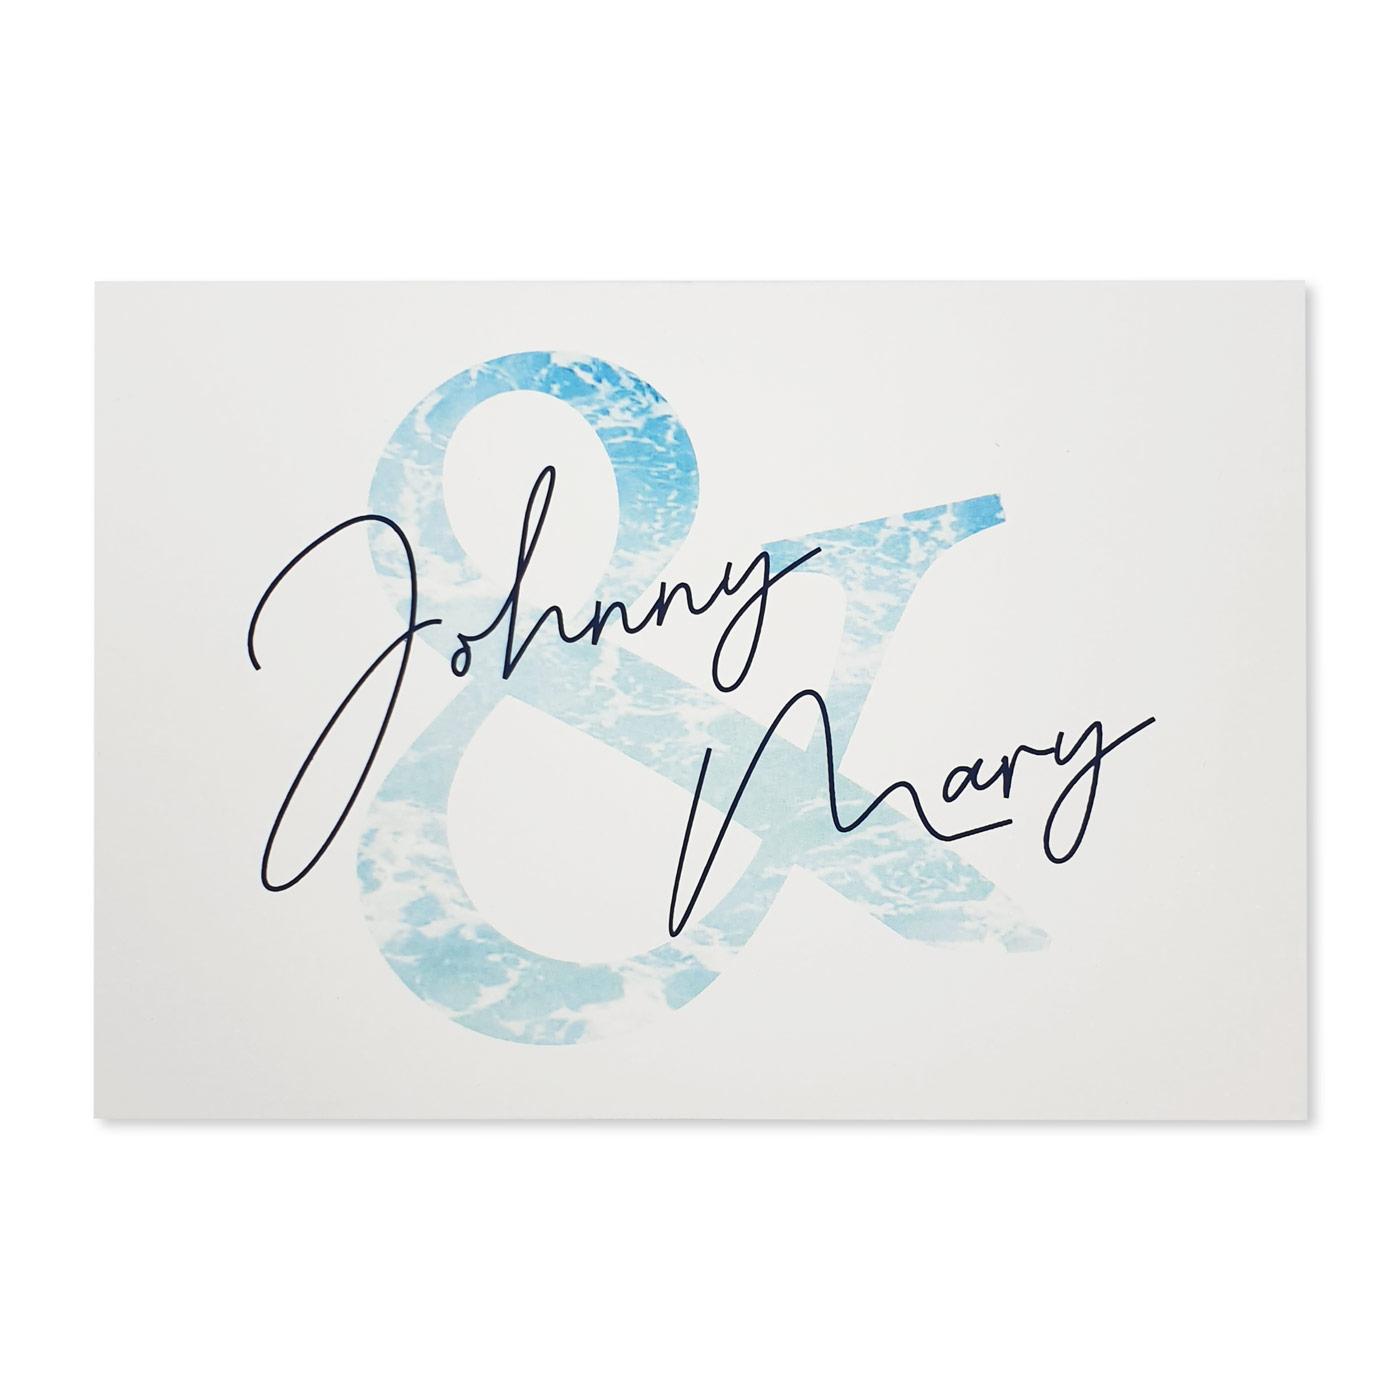 Thank You Cards : TYC-OCEAN_SPRAY - 123WeddingCards